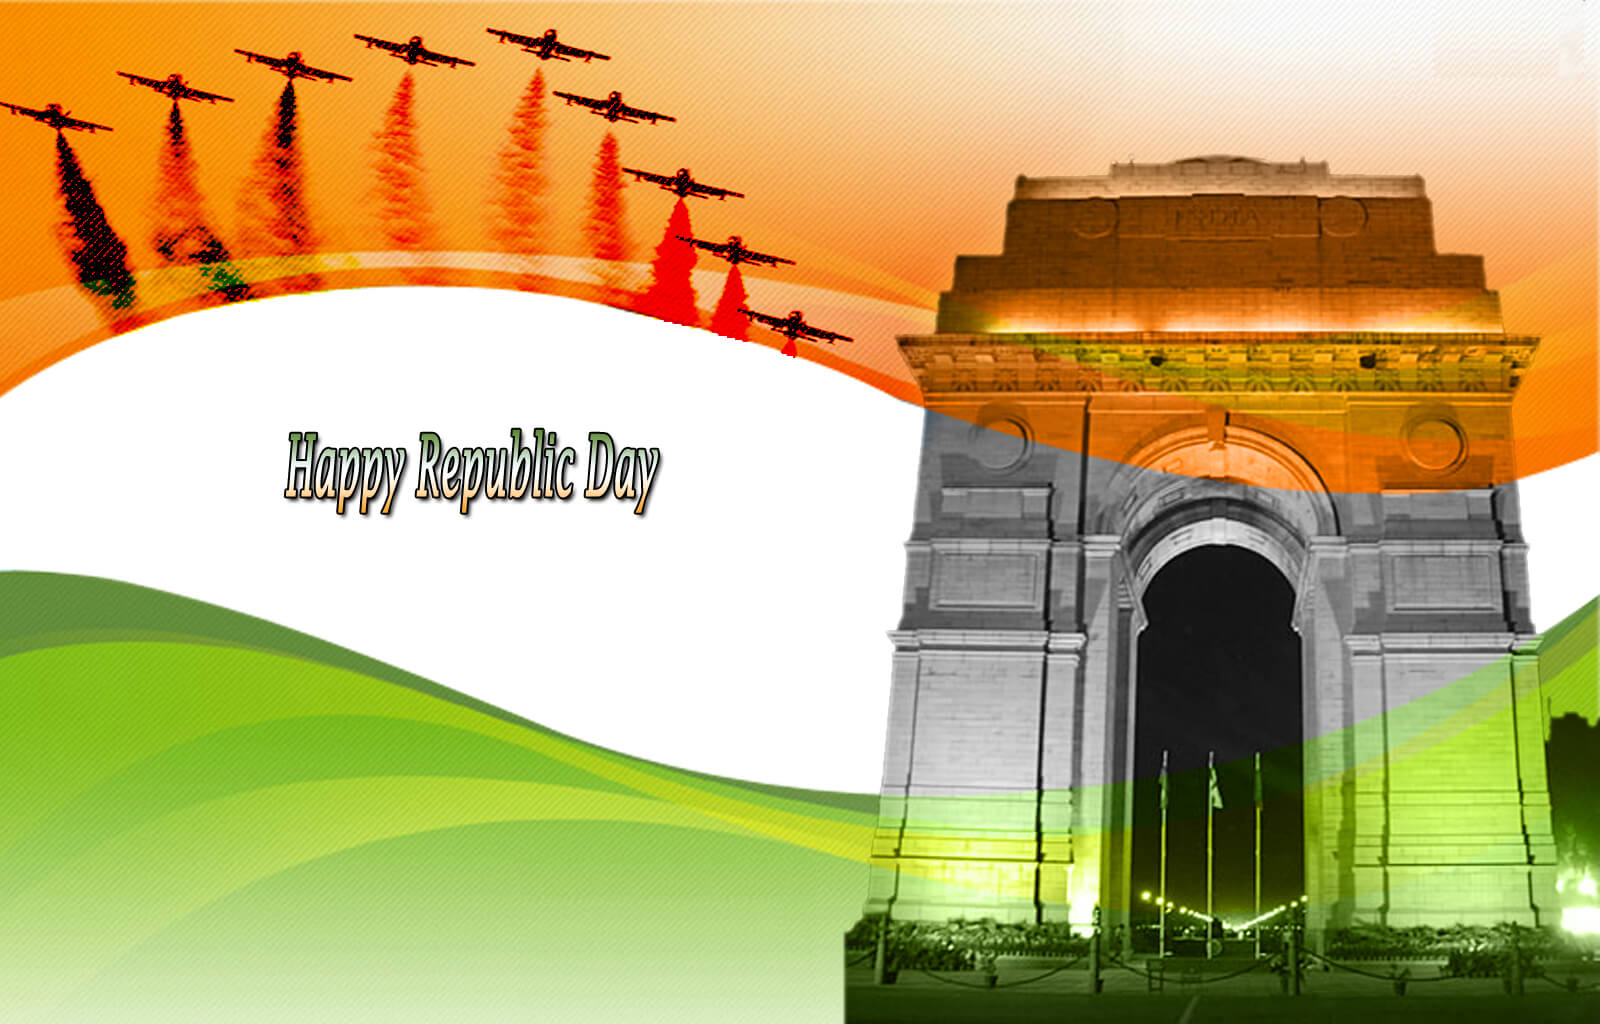 Happy Republic Day in India